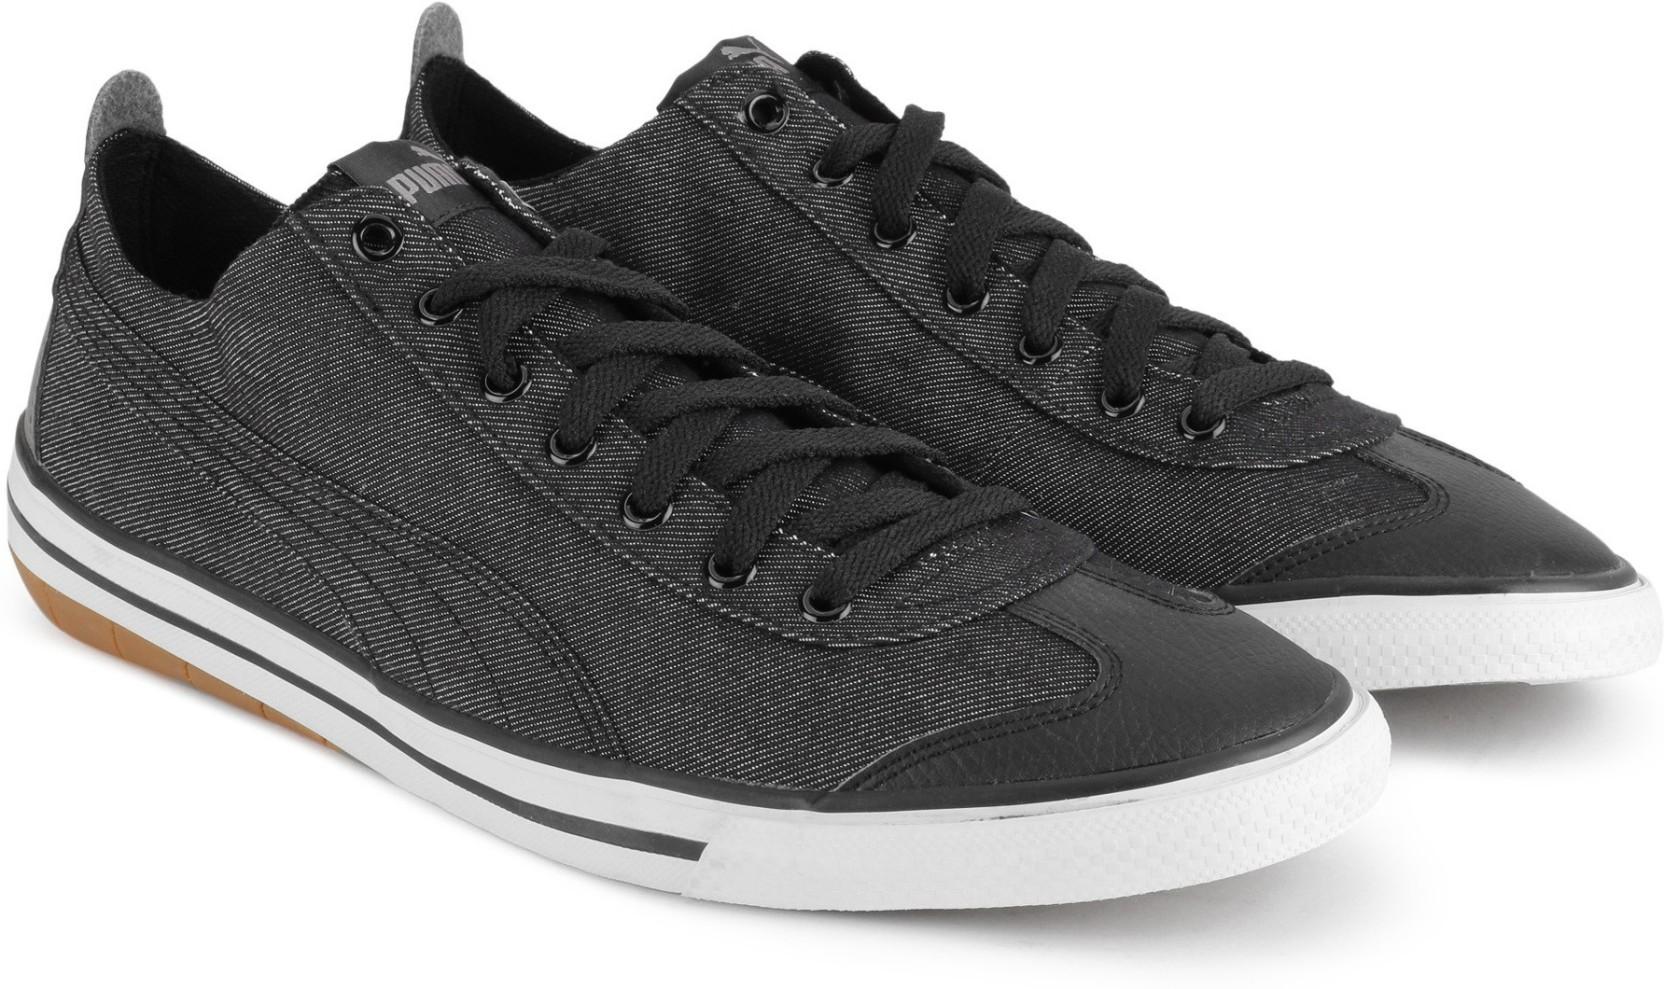 4ff9cc370749 Puma 917 FUN Denim IDP Sneakers For Men - Buy Black-Black Color Puma ...